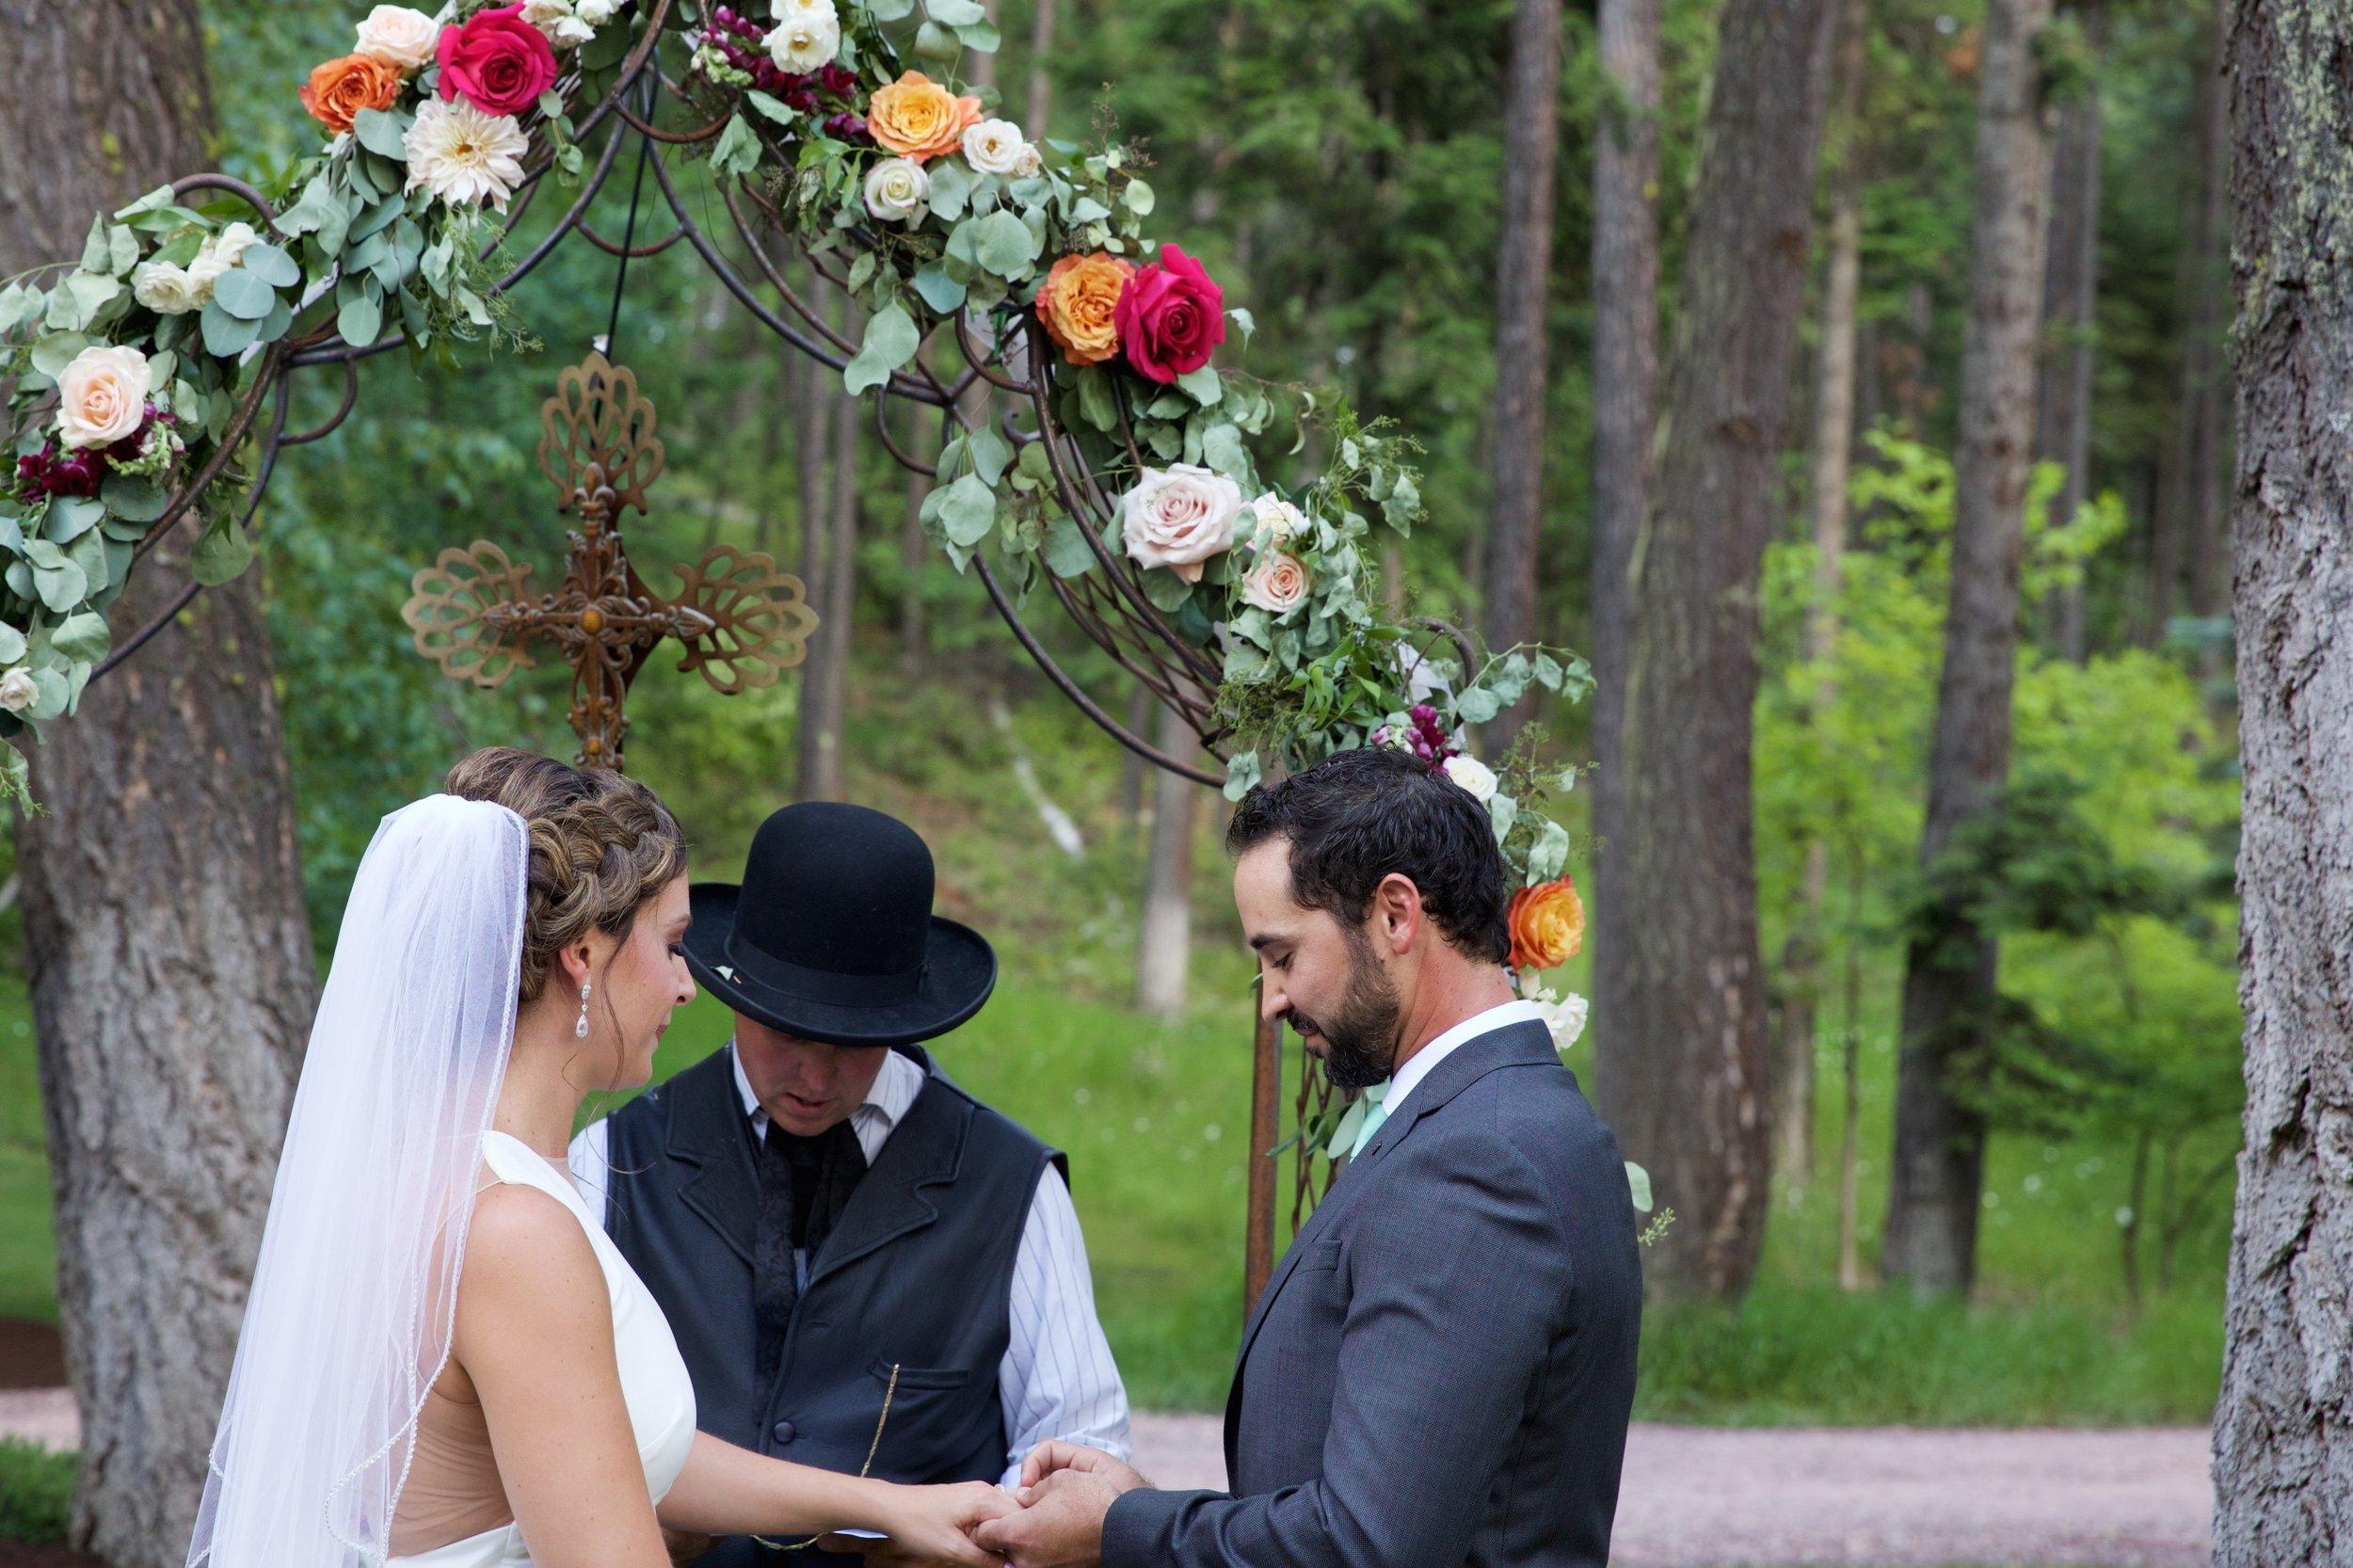 lindseyjane_wedding045.jpg